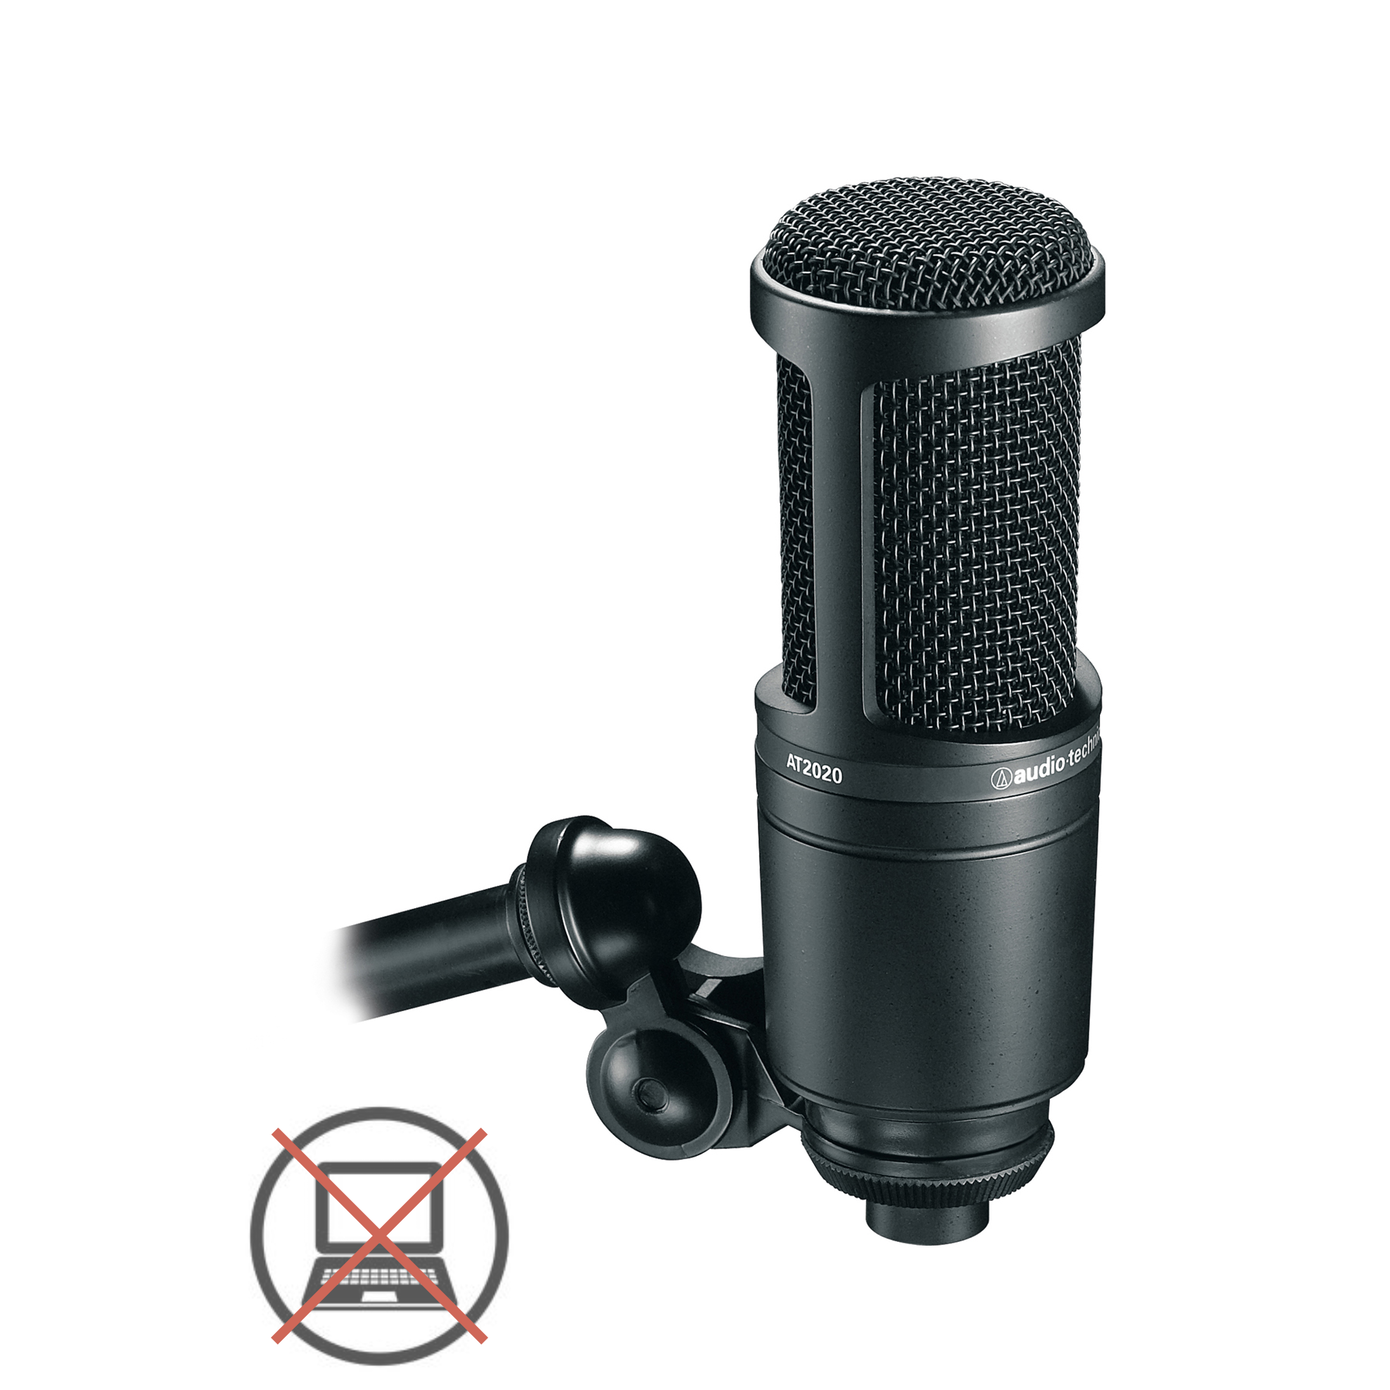 Audio-Technica AT2020 - XLR